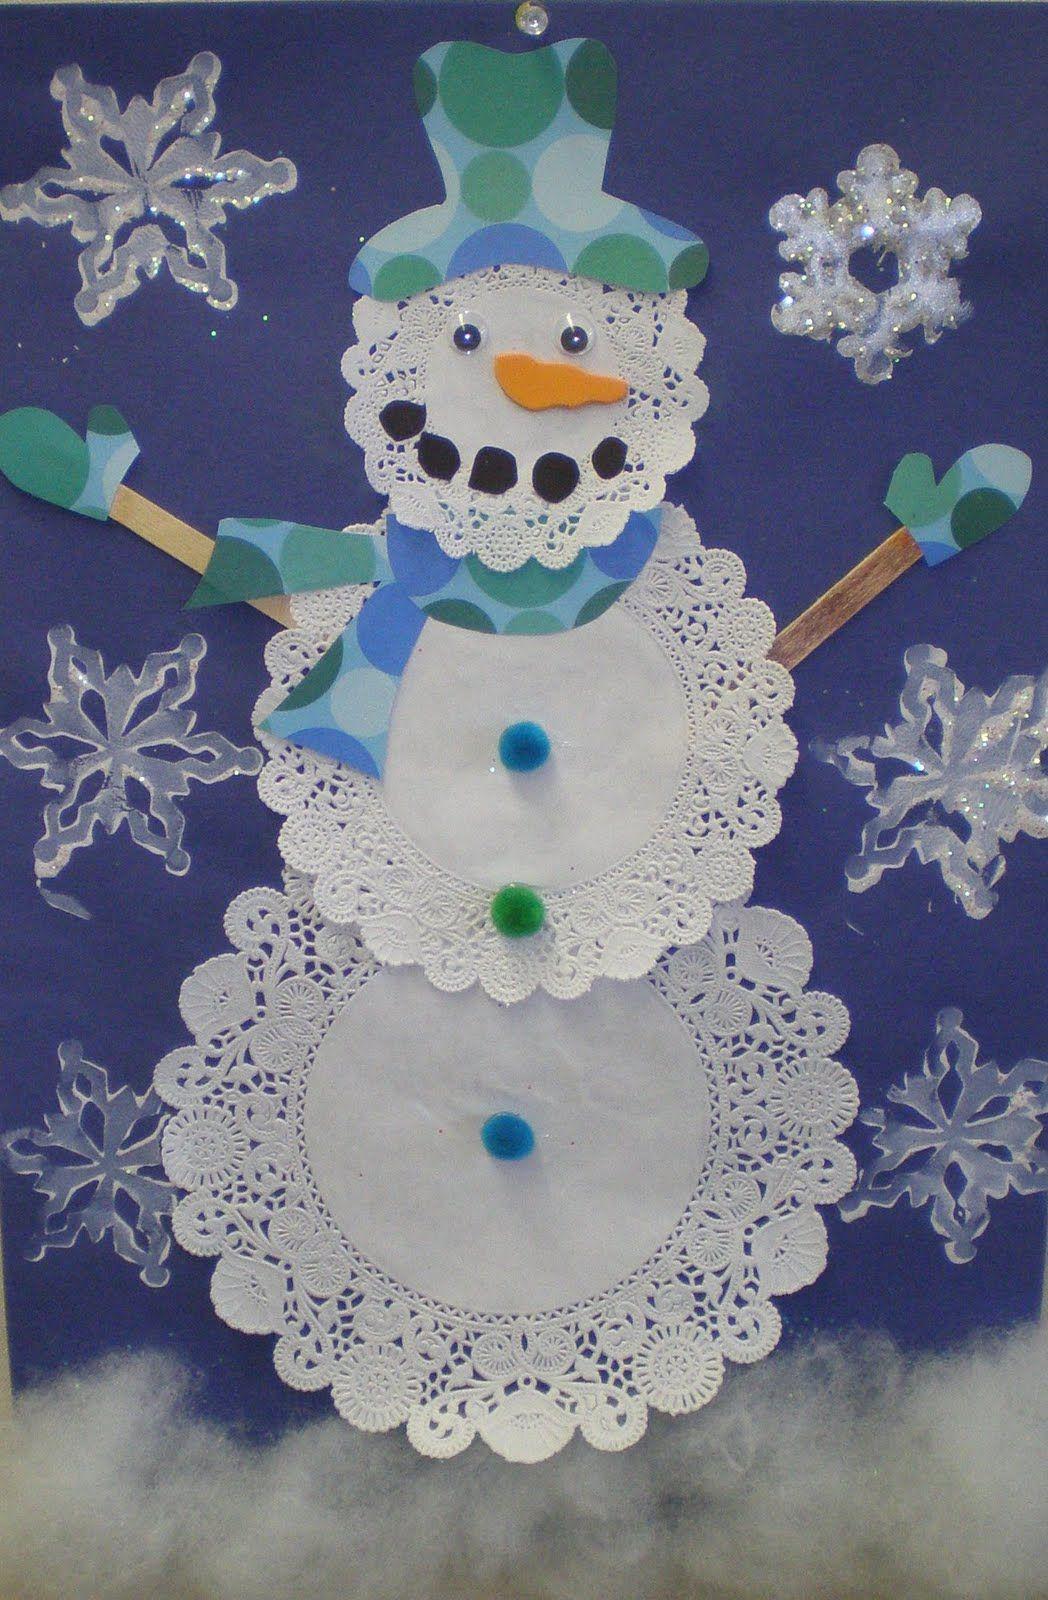 Doiley snowman 3 doilies 3 pom poms 2 popsicle sticks 2 wiggly doily snowmen winter craft for kids or s for snowman jeuxipadfo Images